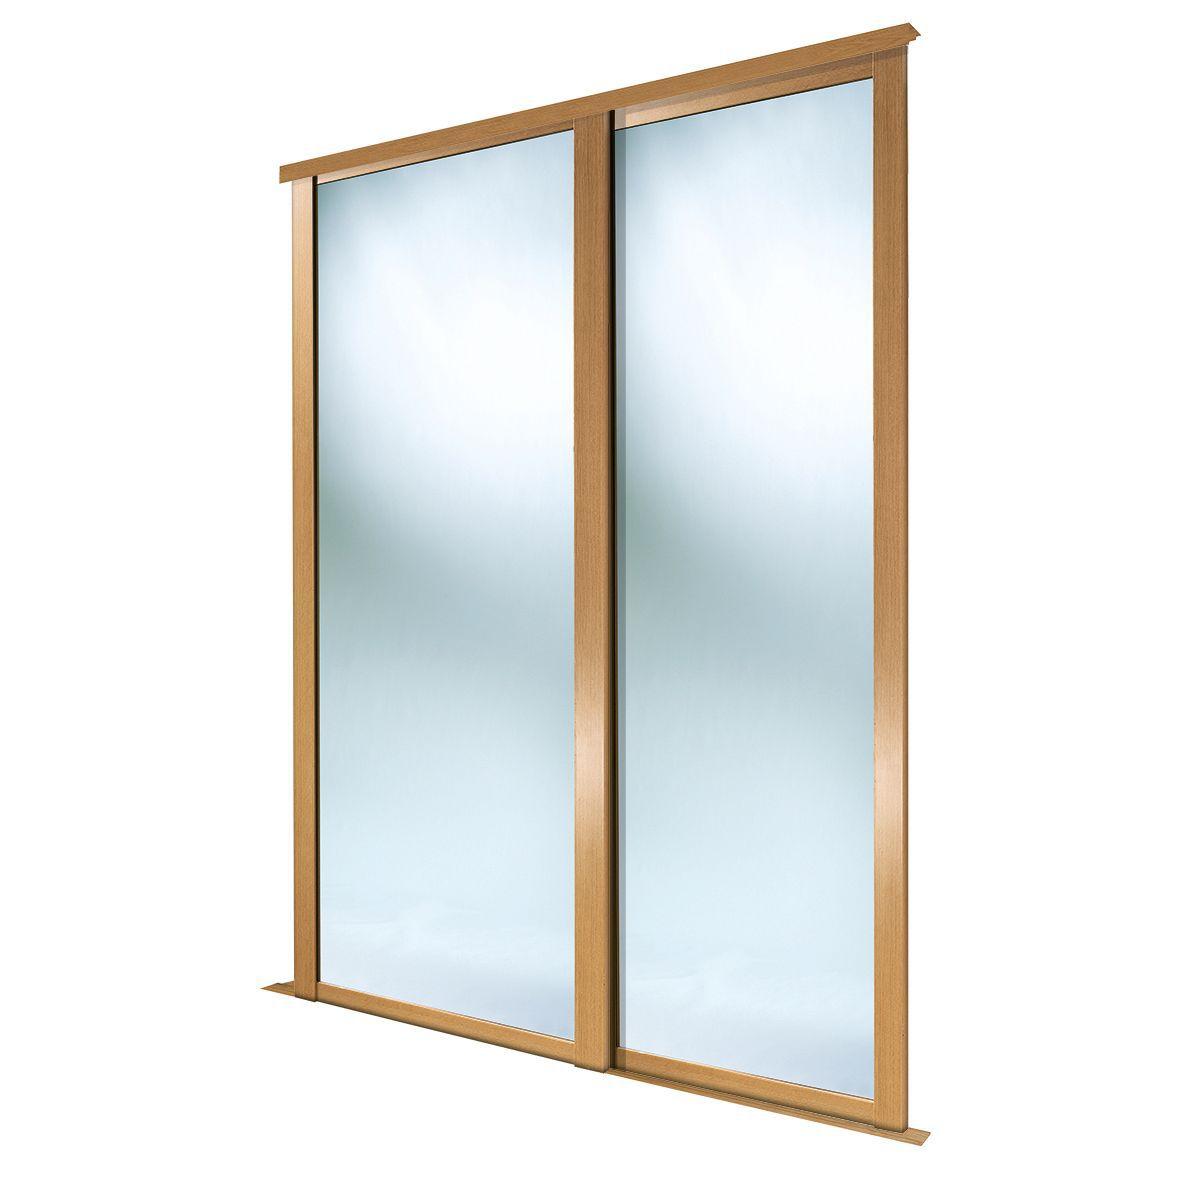 Full Length Mirror Natural Oak Effect Sliding Wardrobe Door (h)2223 Mm (w)914 Mm, Pack Of 2